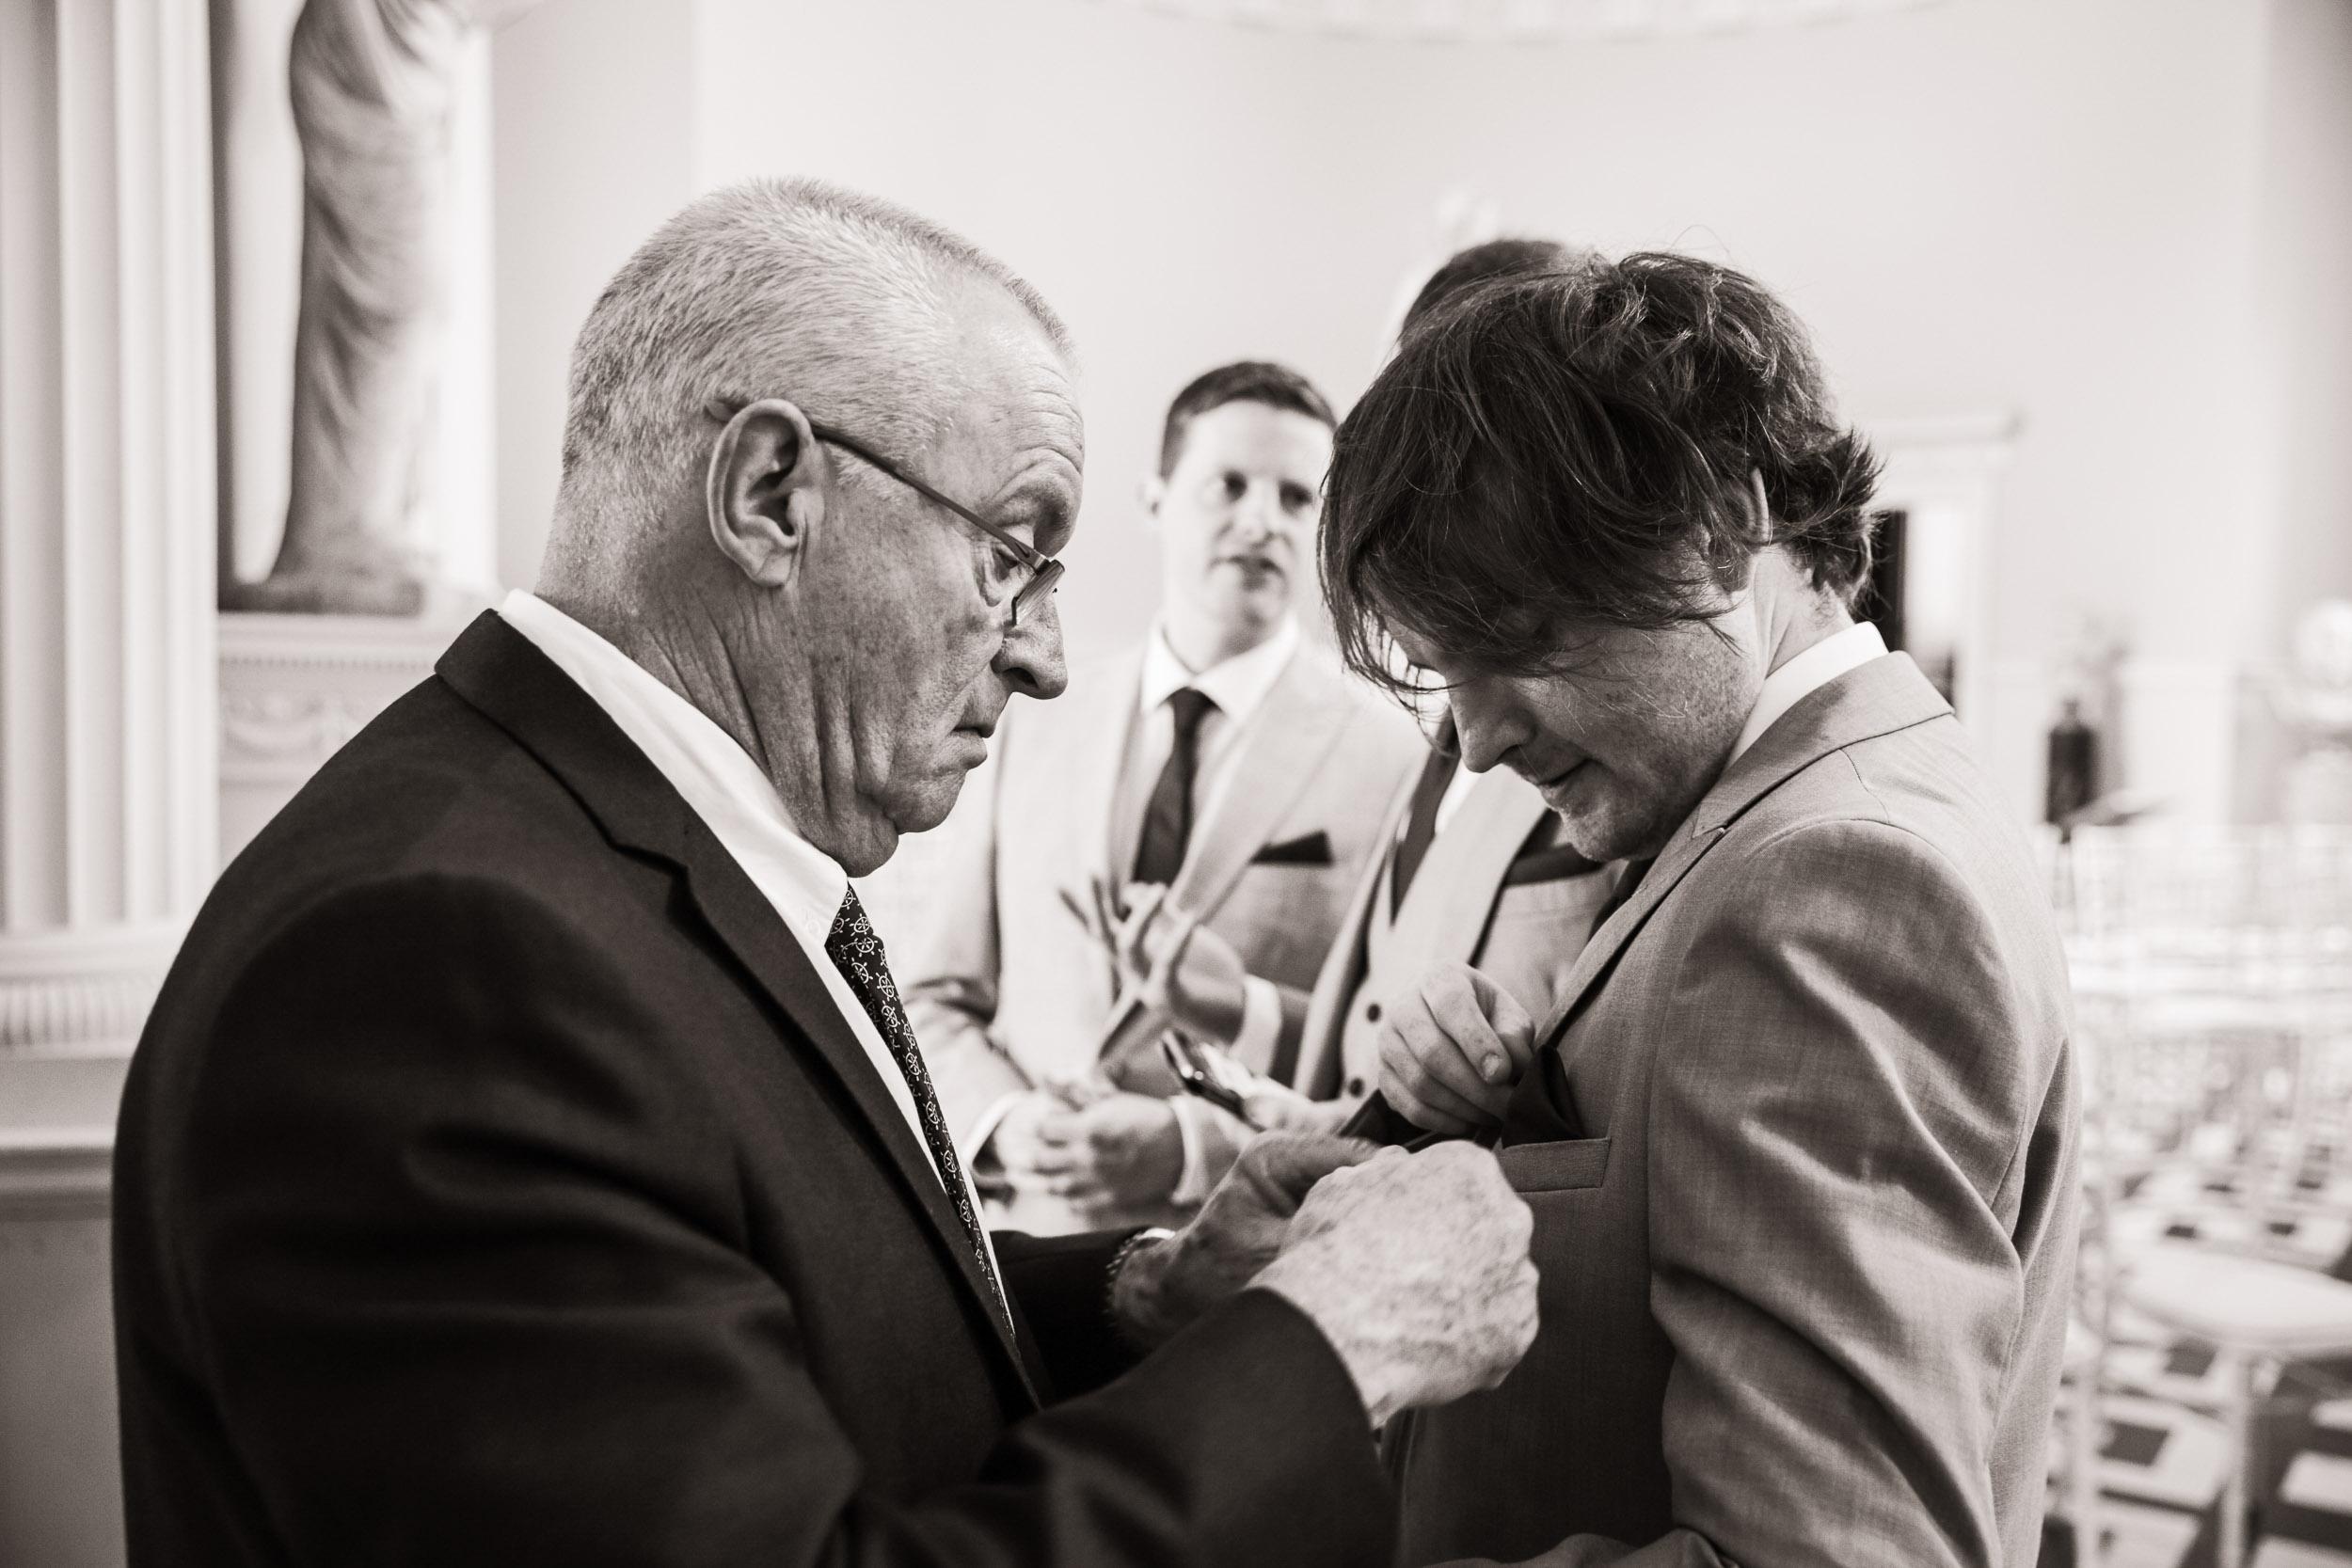 syon-house-wedding-photographer-london 023.jpg